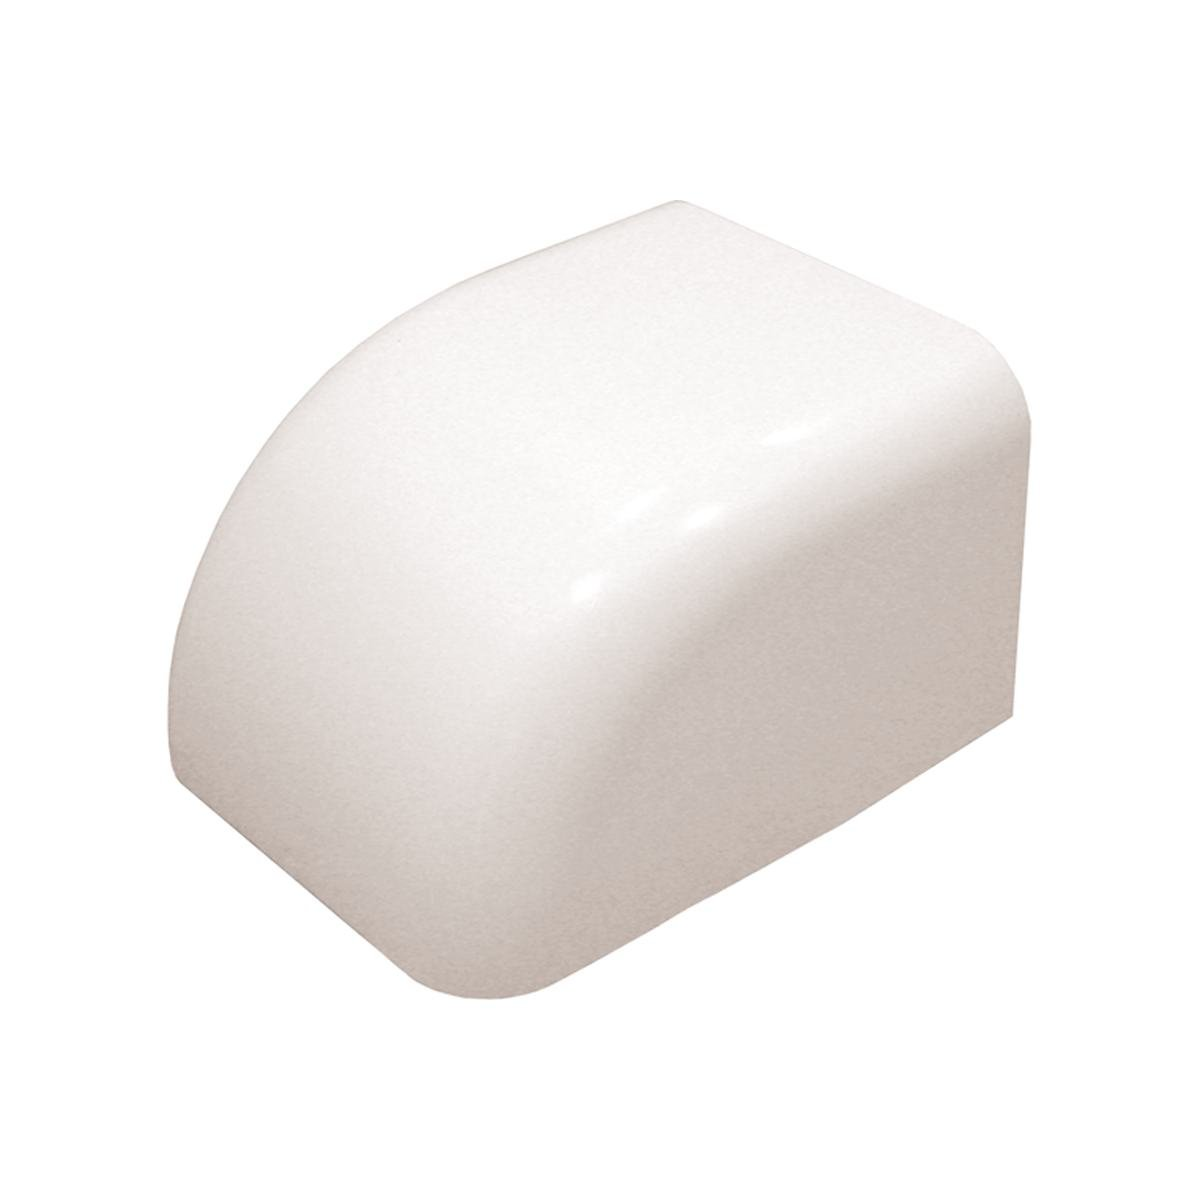 Gavellock utan kant 80 x 60 mm vit